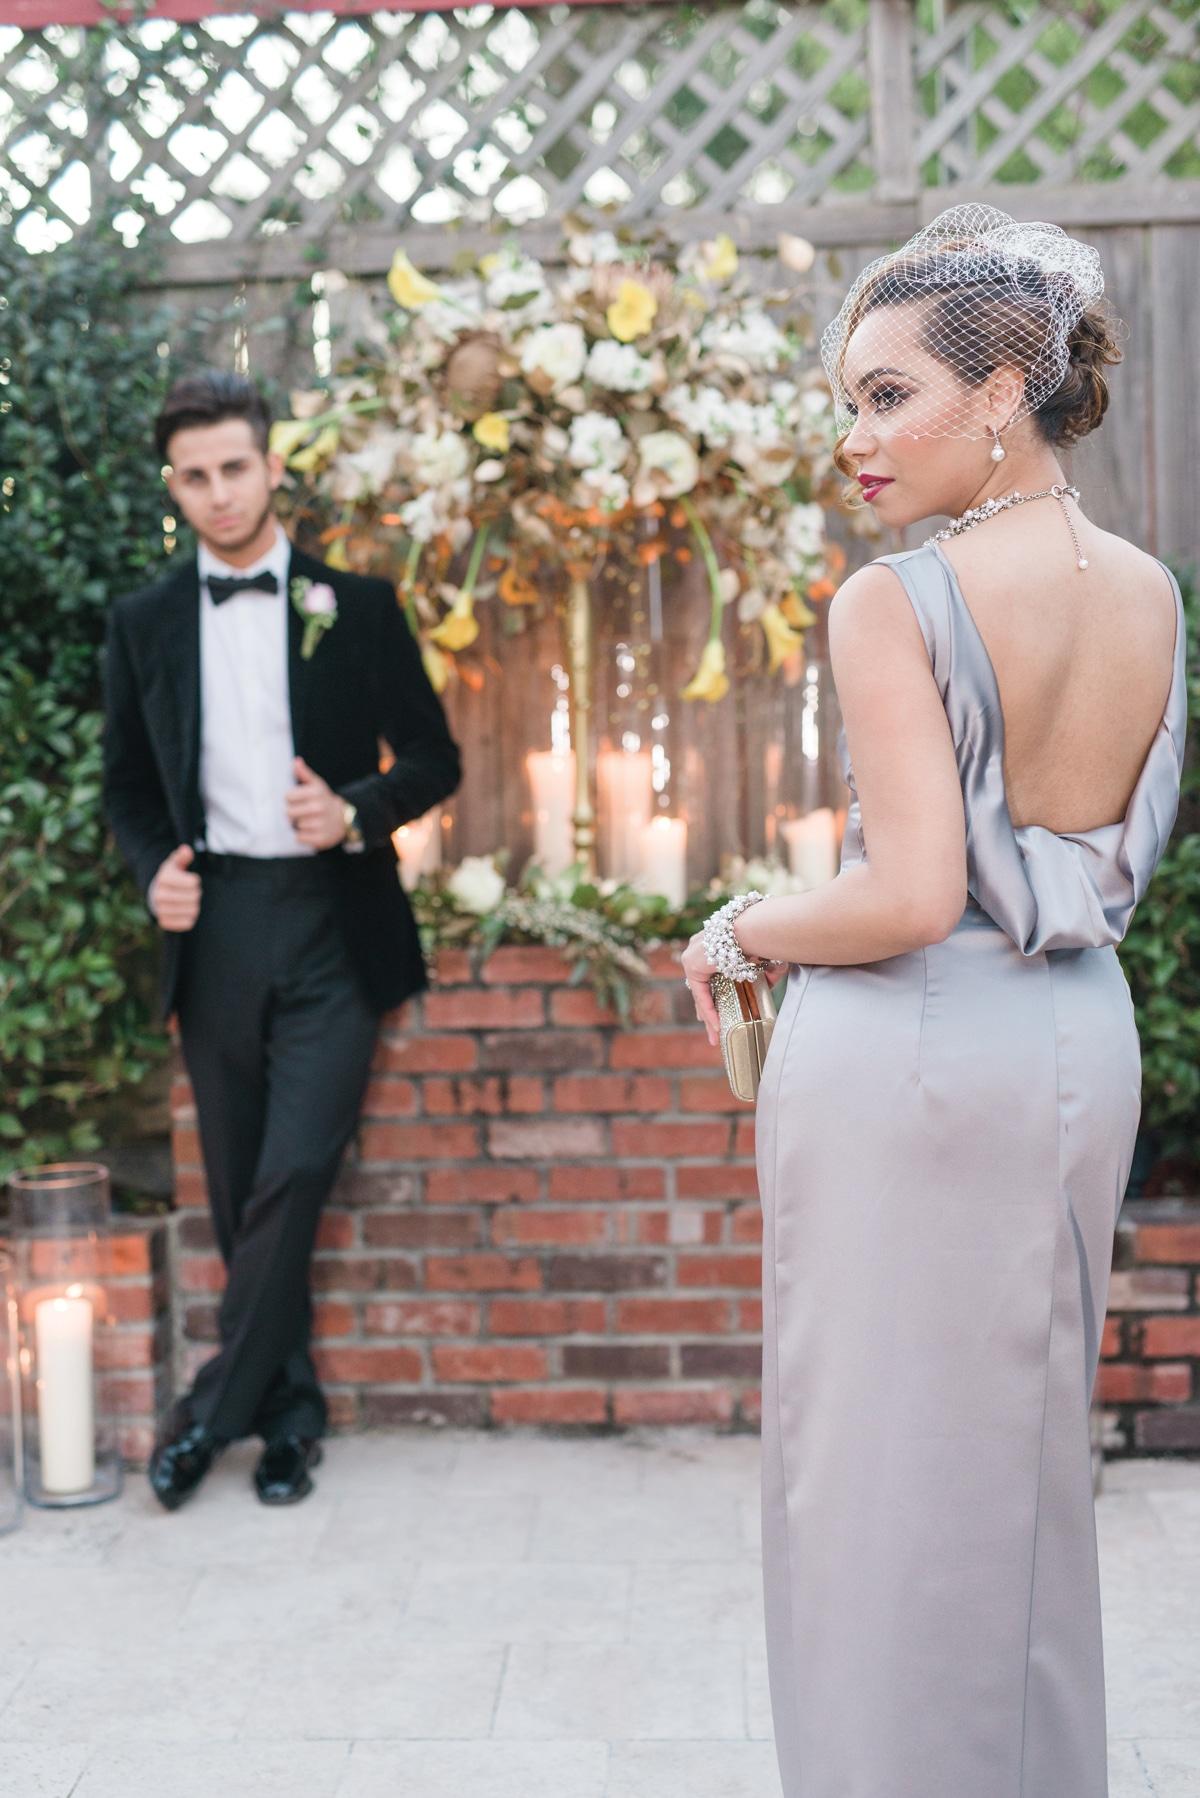 PHOTOGRAPHER: Nicoll's Wedding Photography